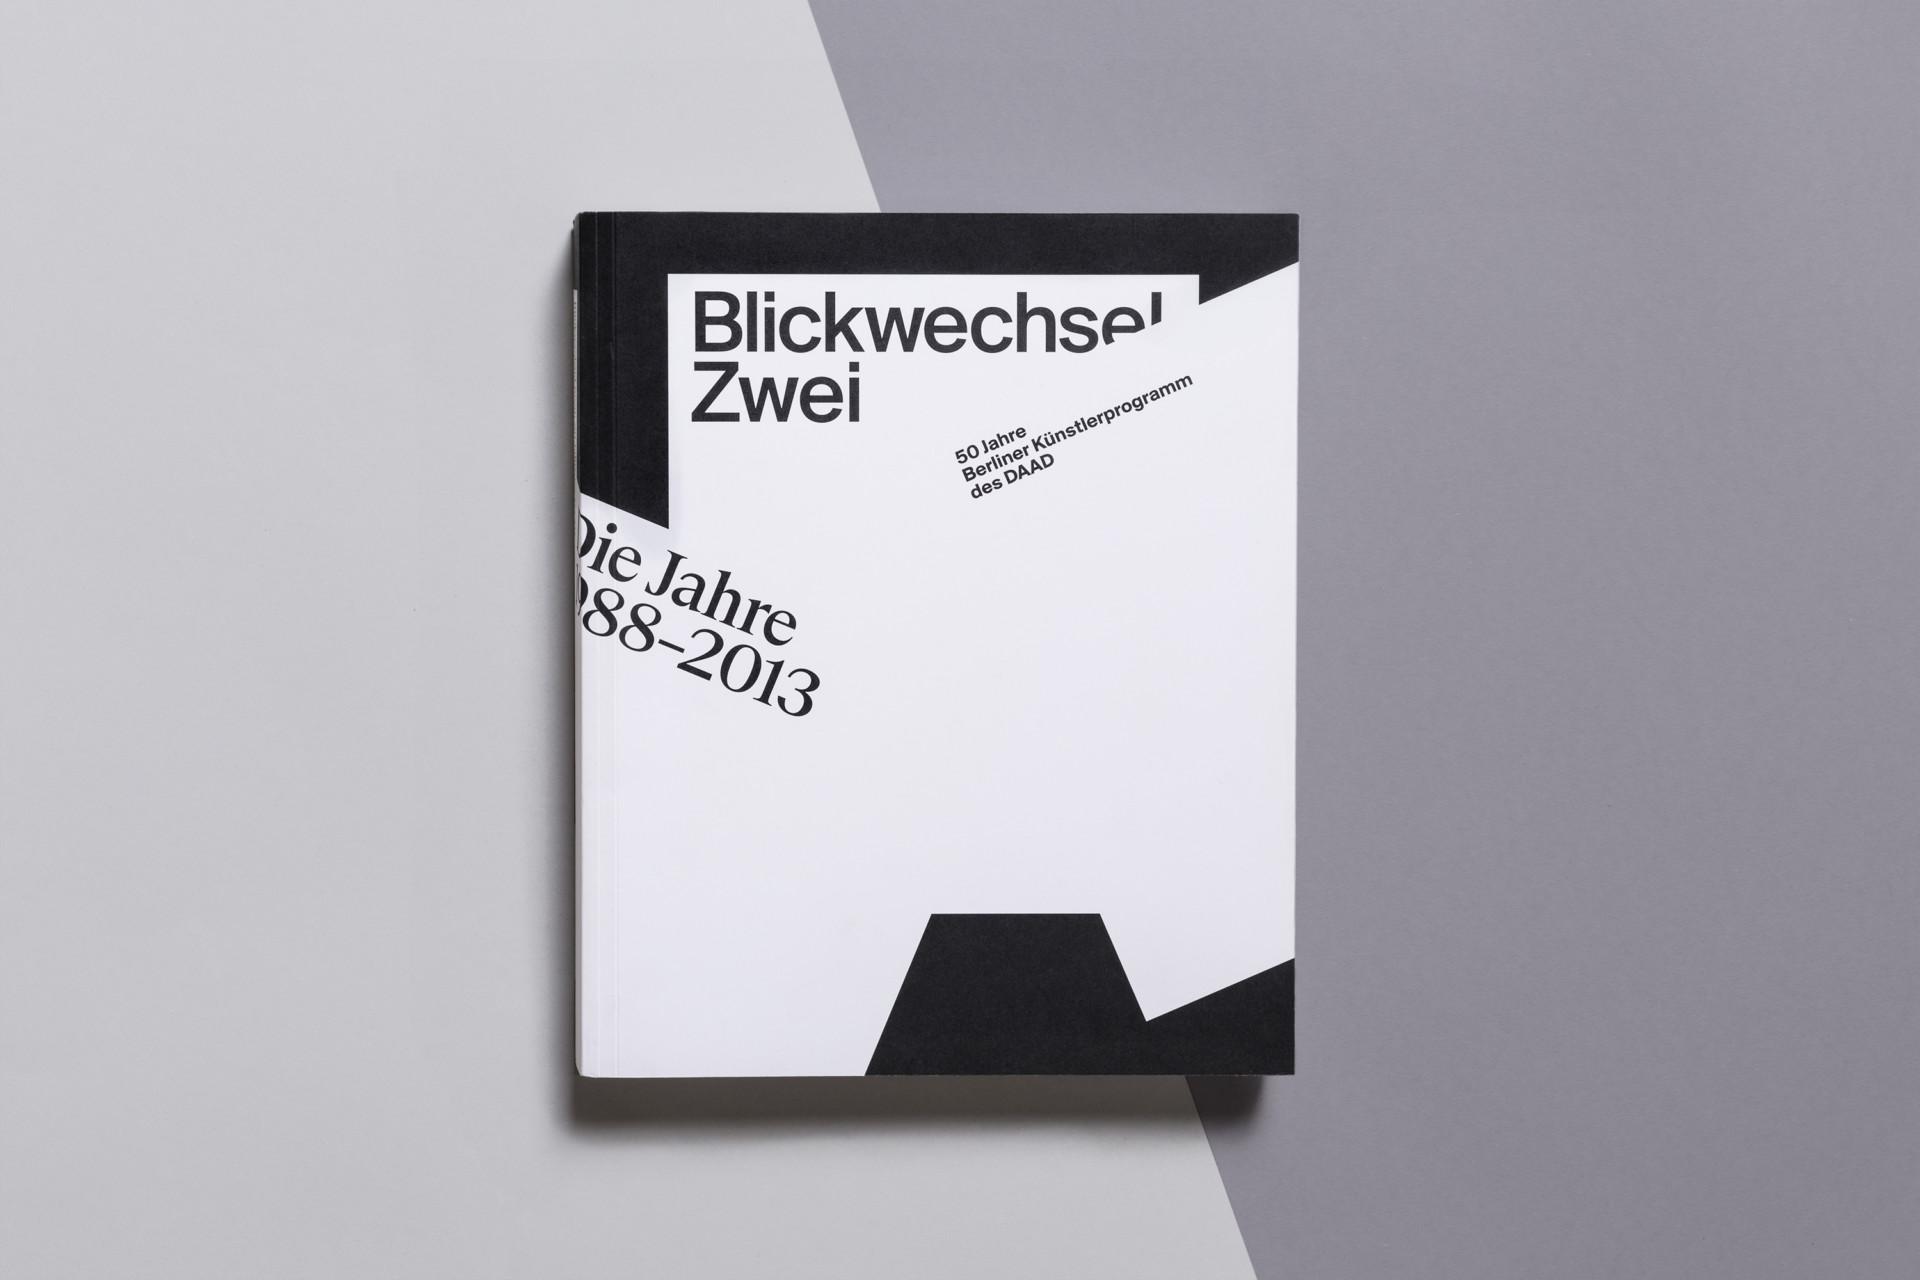 JOHANNES AMMLER DAAD Blickwechsel II